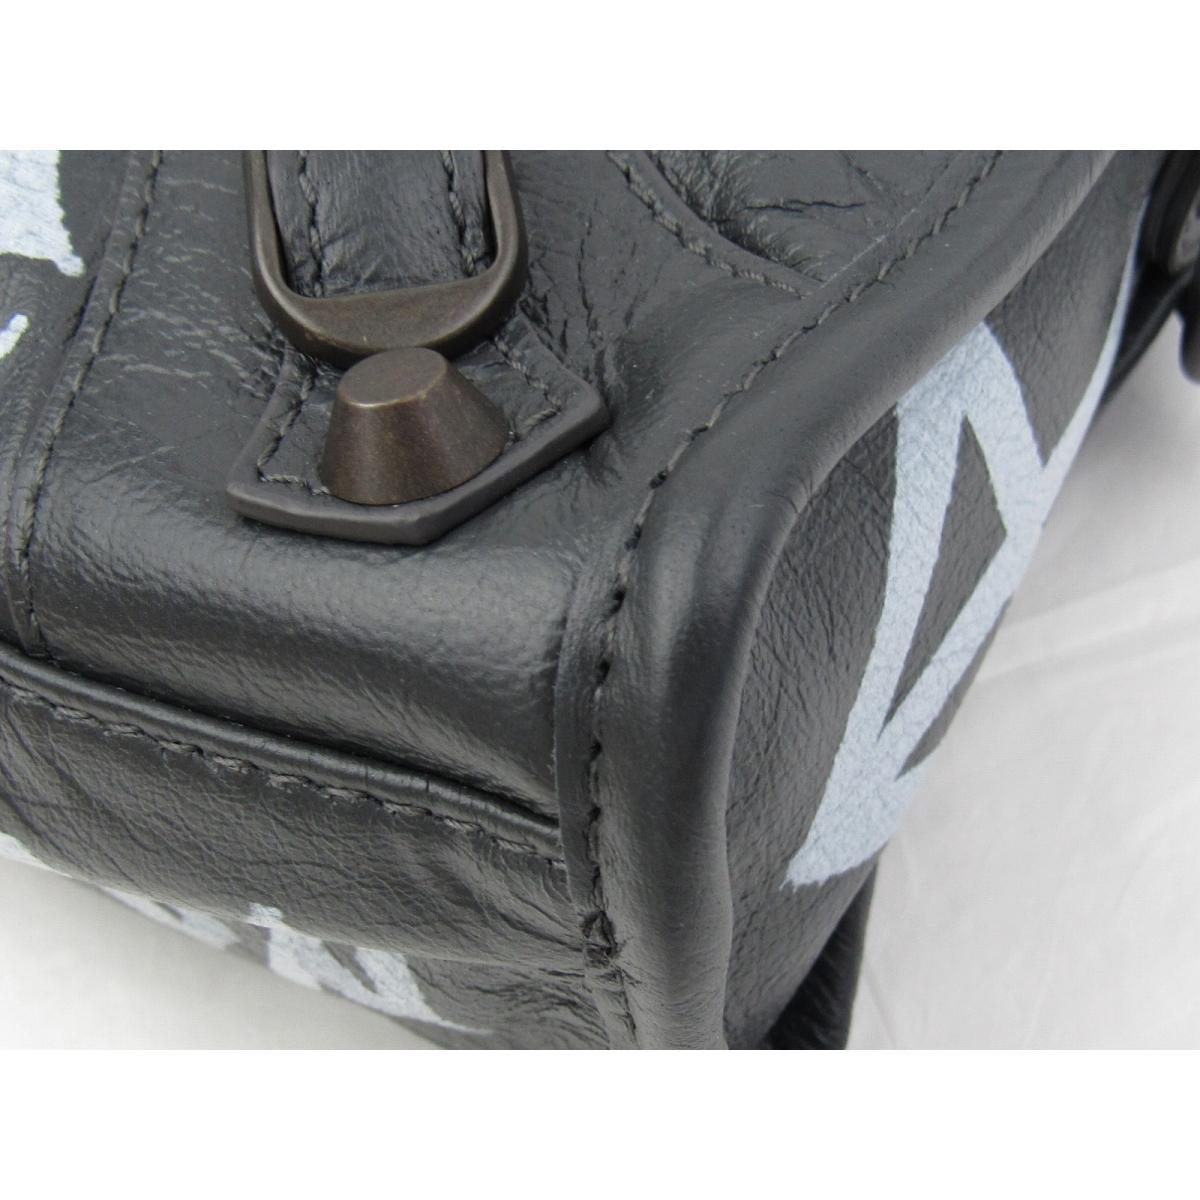 59c4bb6cd514f Authentic BALENCIAGA Graffiti Classic Mini City Shoulder Bag 300295 Goat  leather Gray